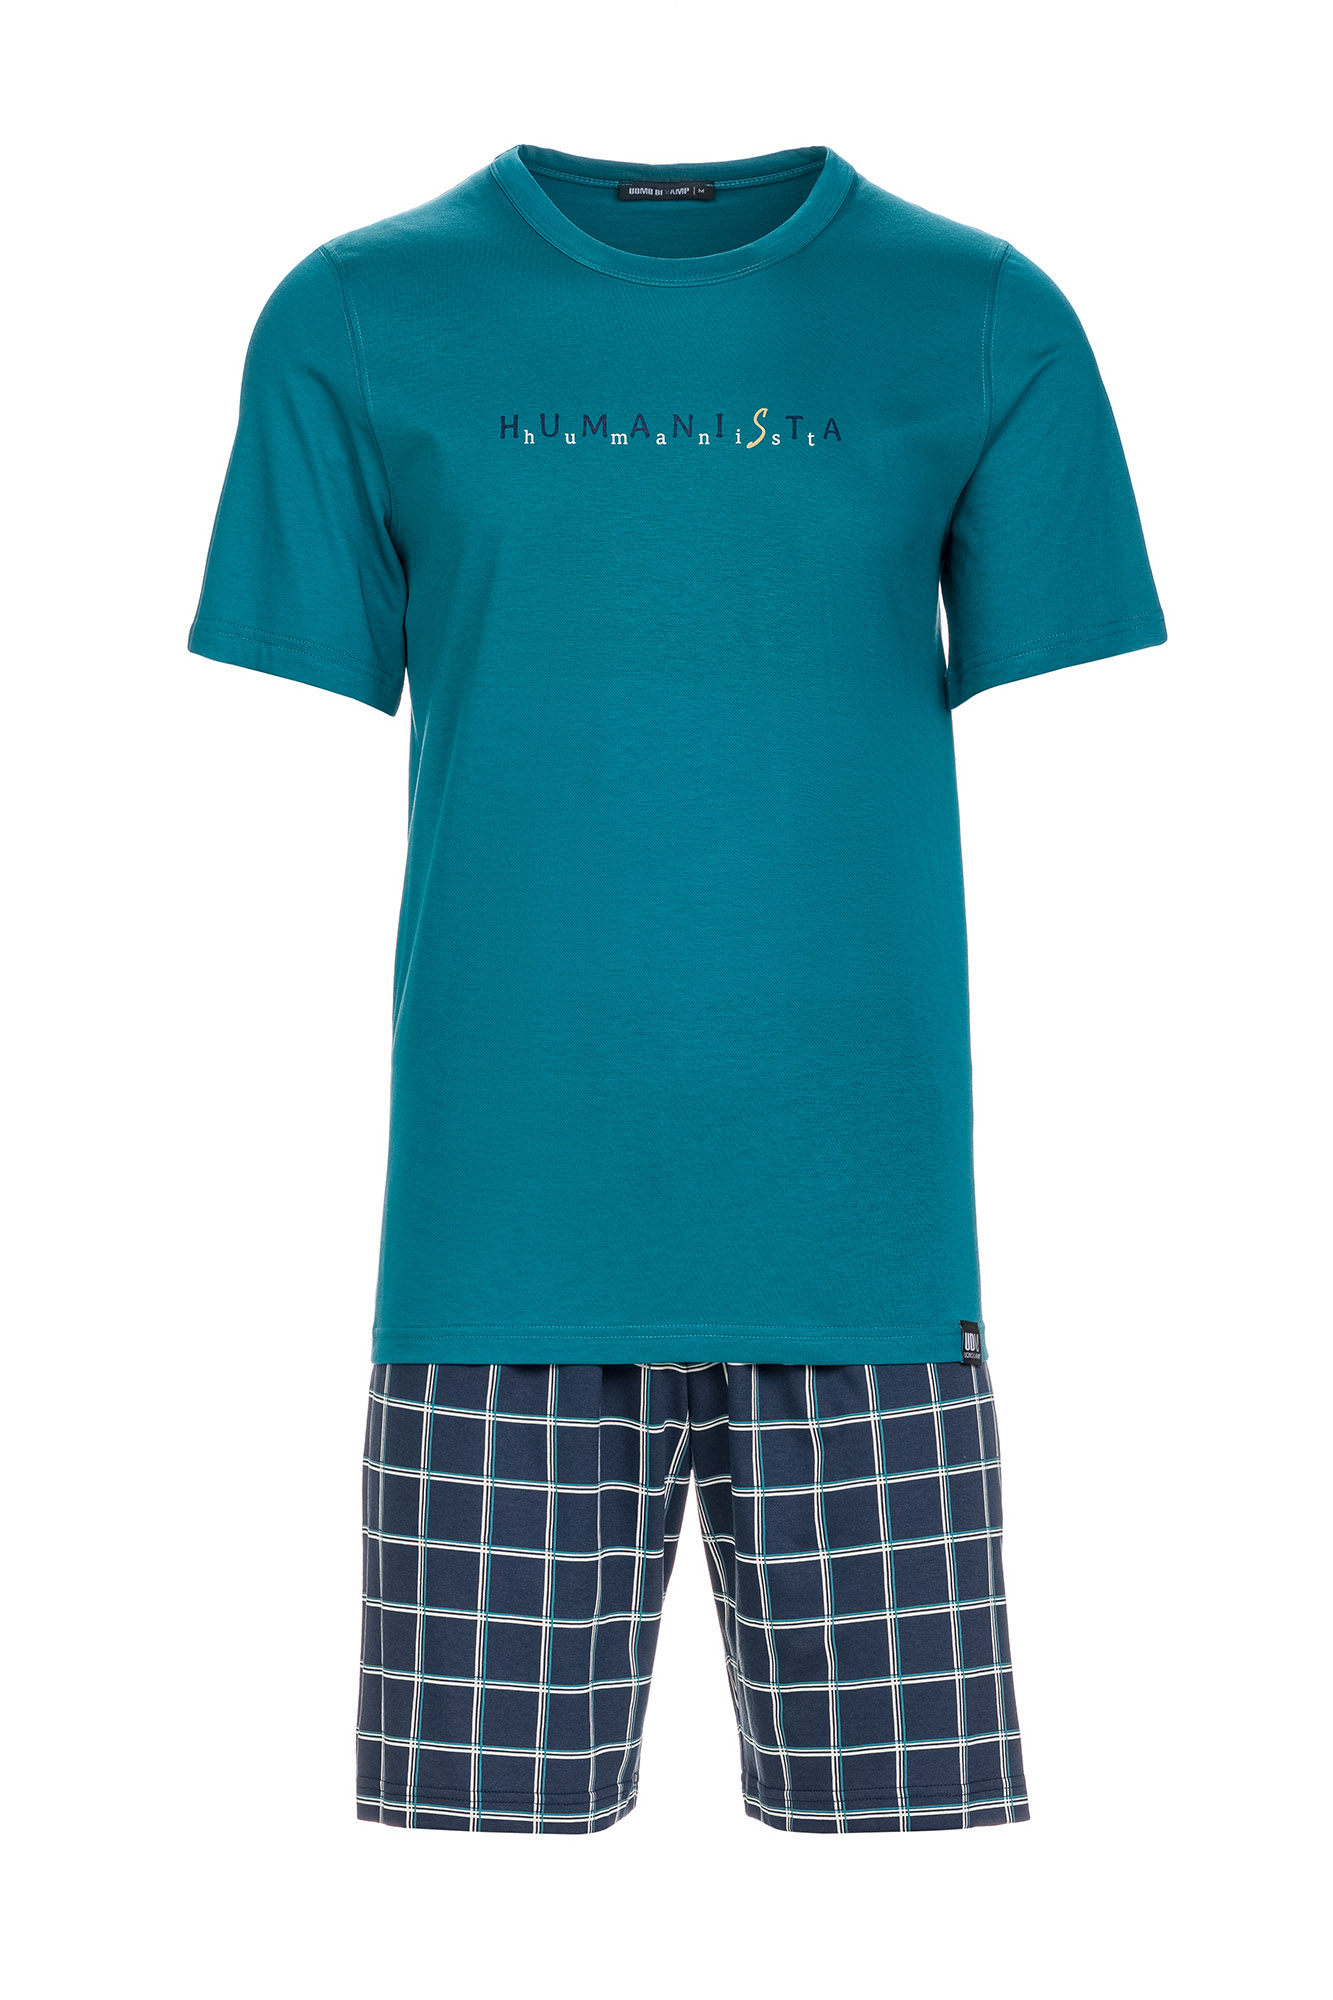 Vamp - Pánske pohodlné pyžamo 13628 - Vamp petrol l